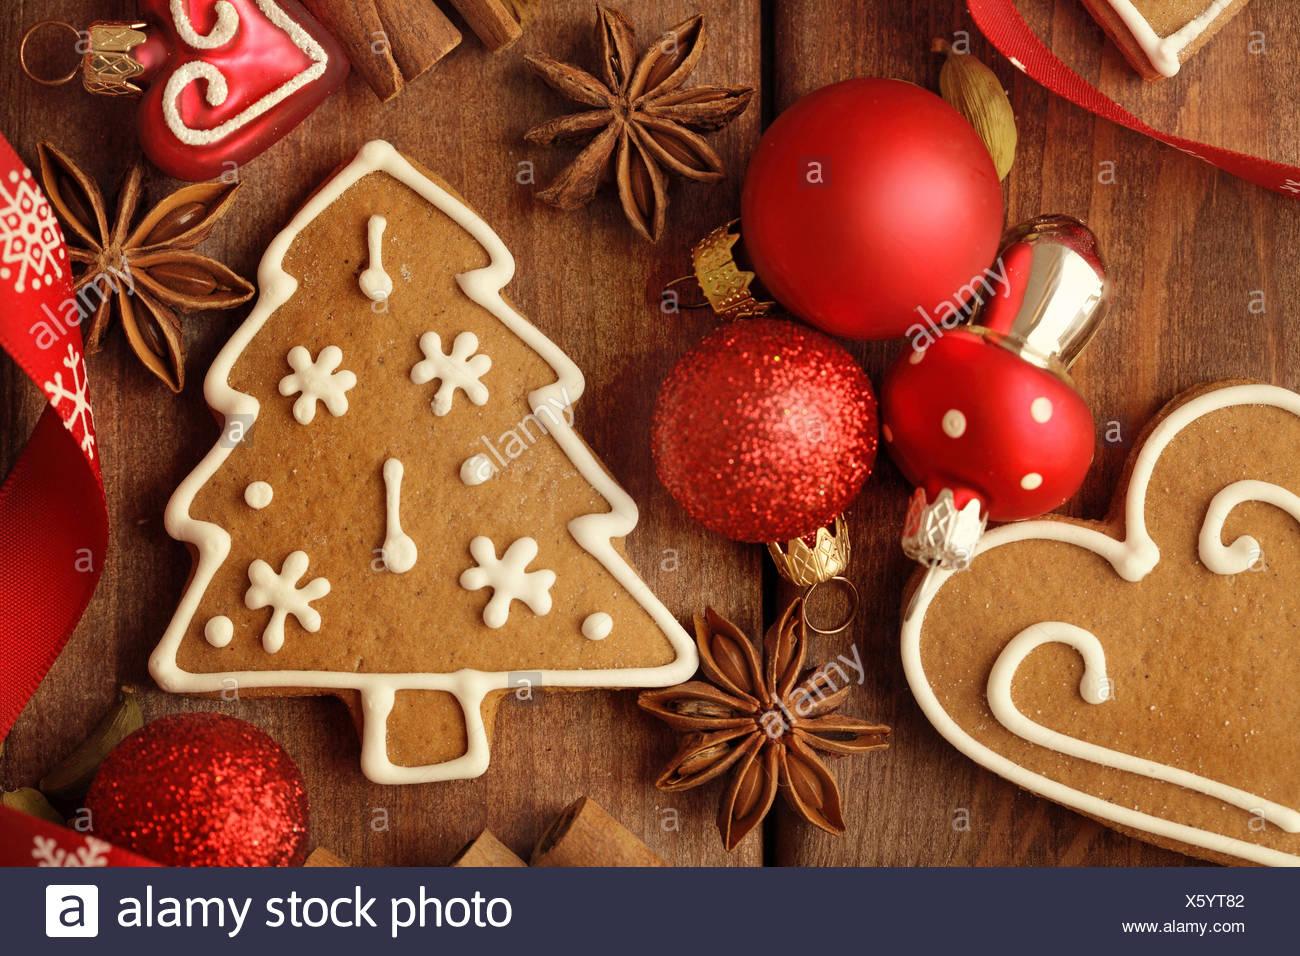 Christmas Cookies Gingerbread Christmas Tree Decorations Stock Photo Alamy